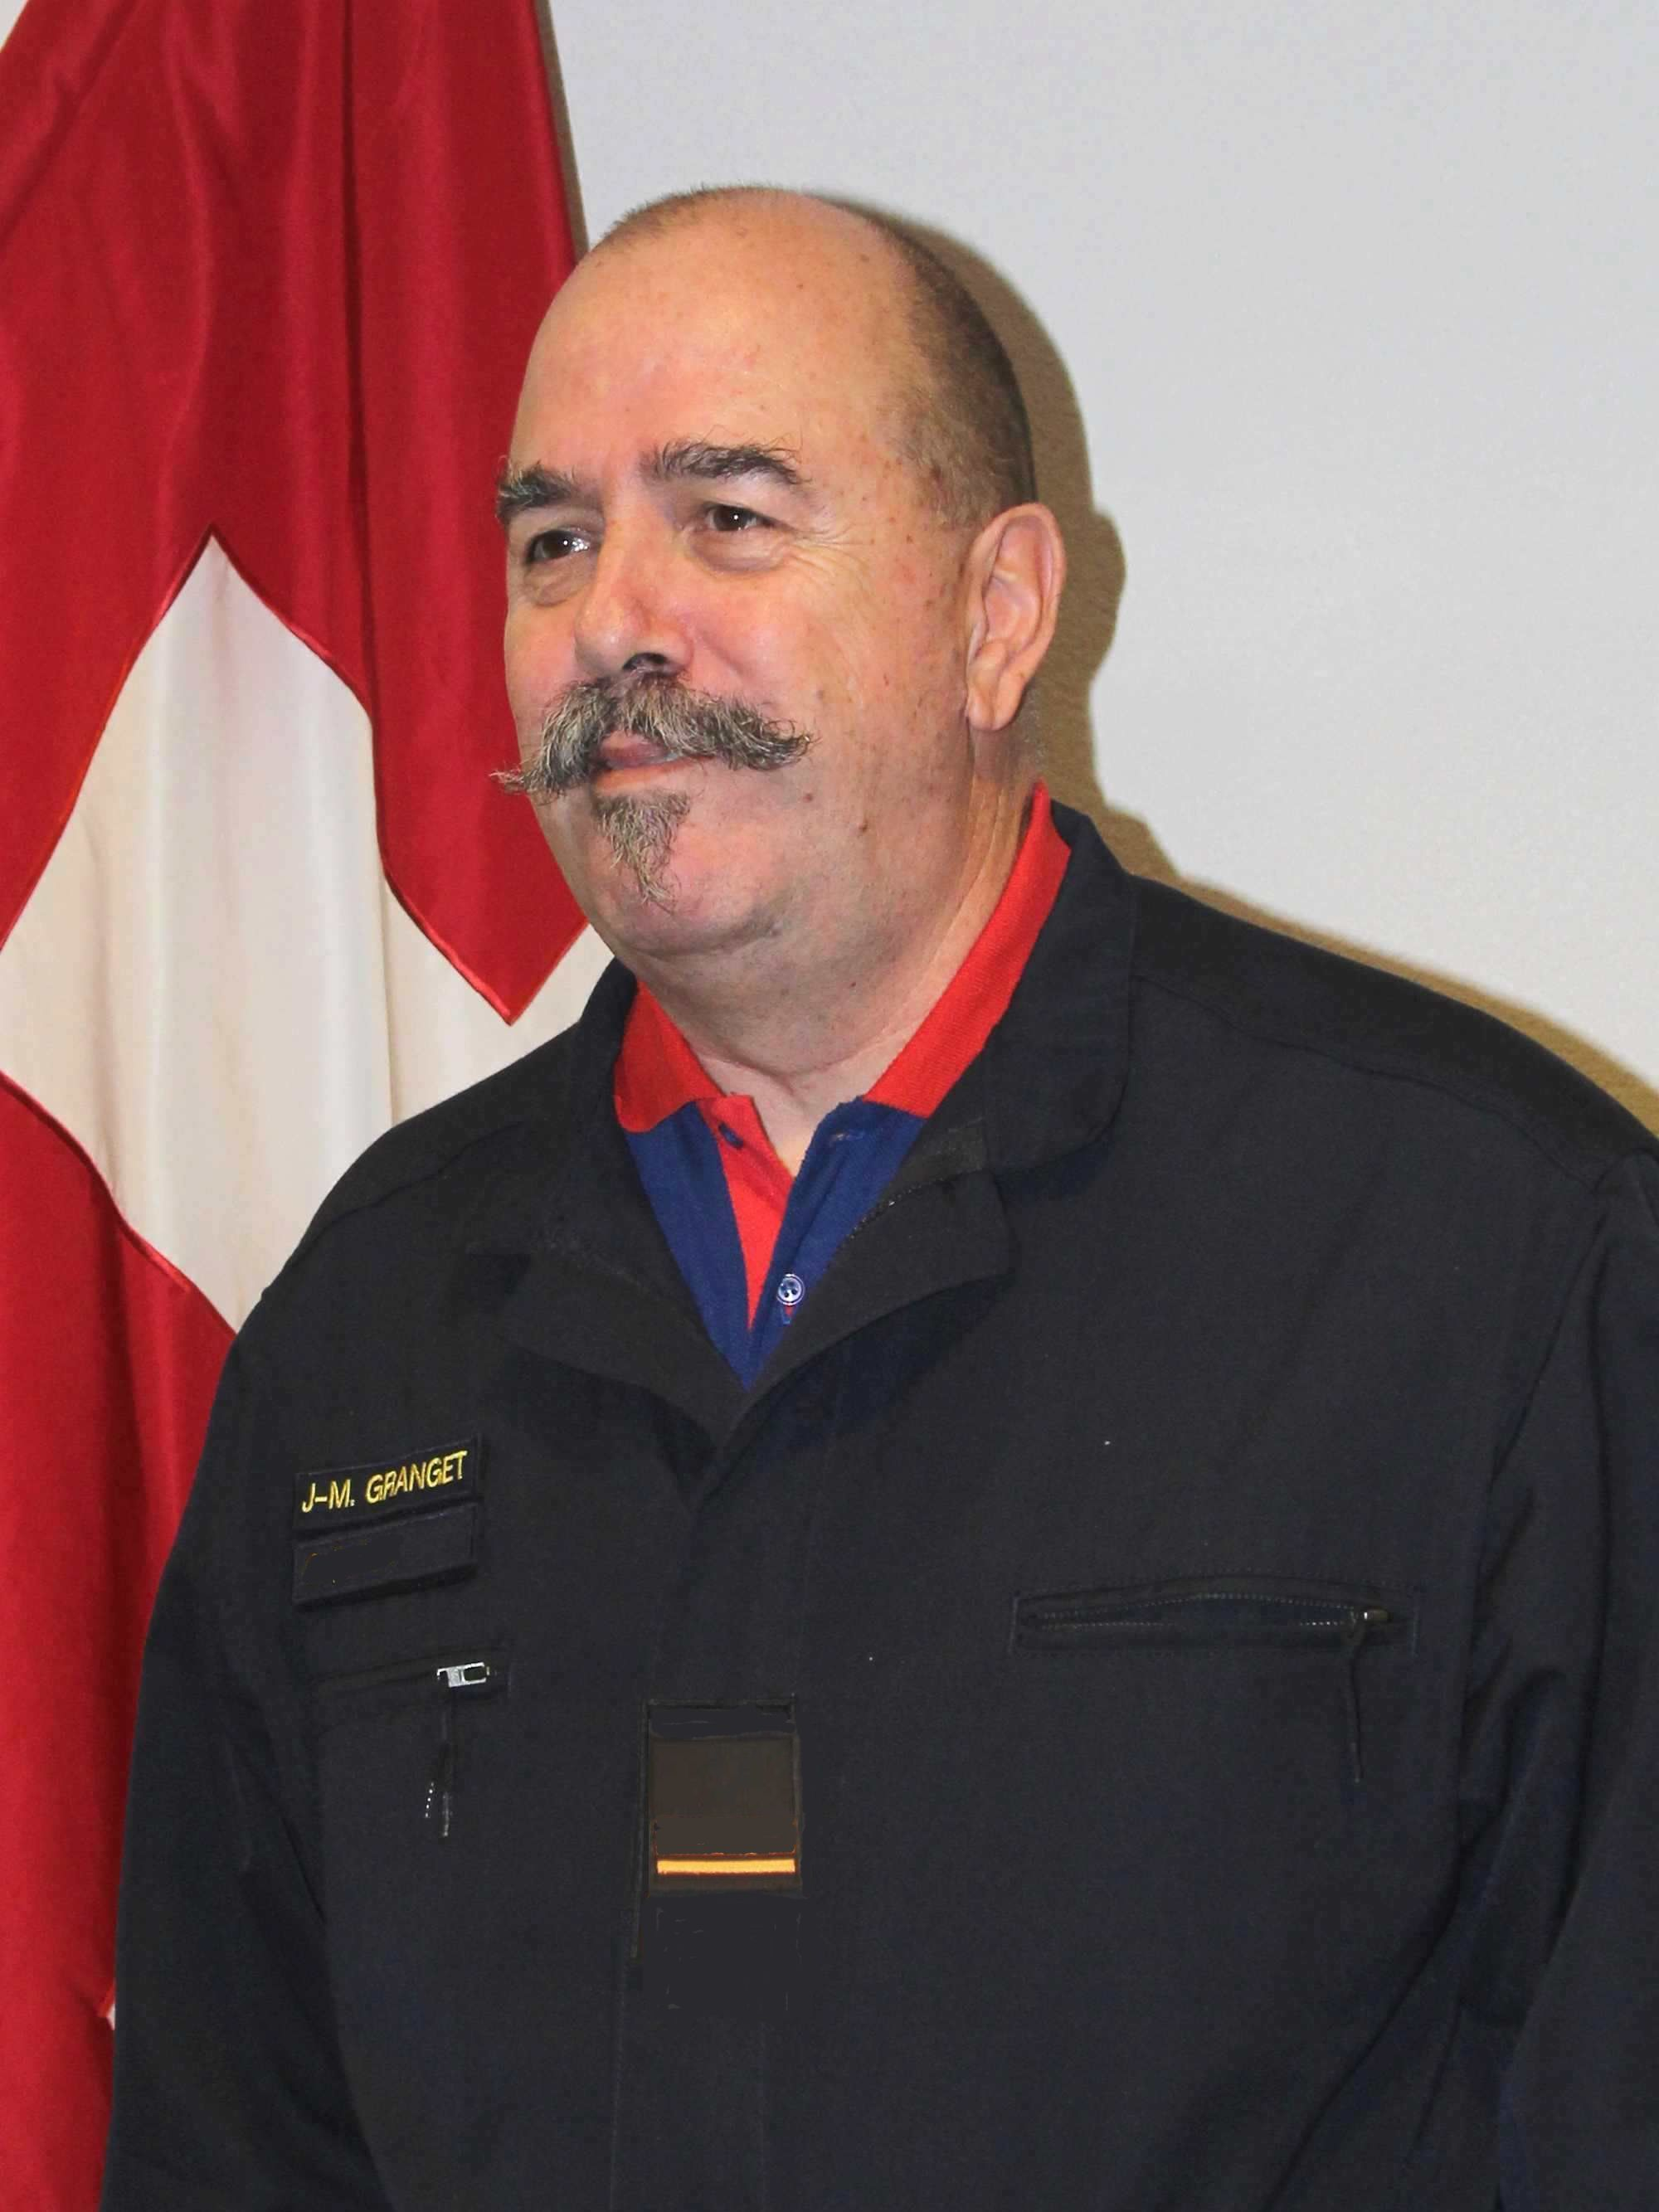 Lieutenant Jean-Marc Granget,  Enseigne